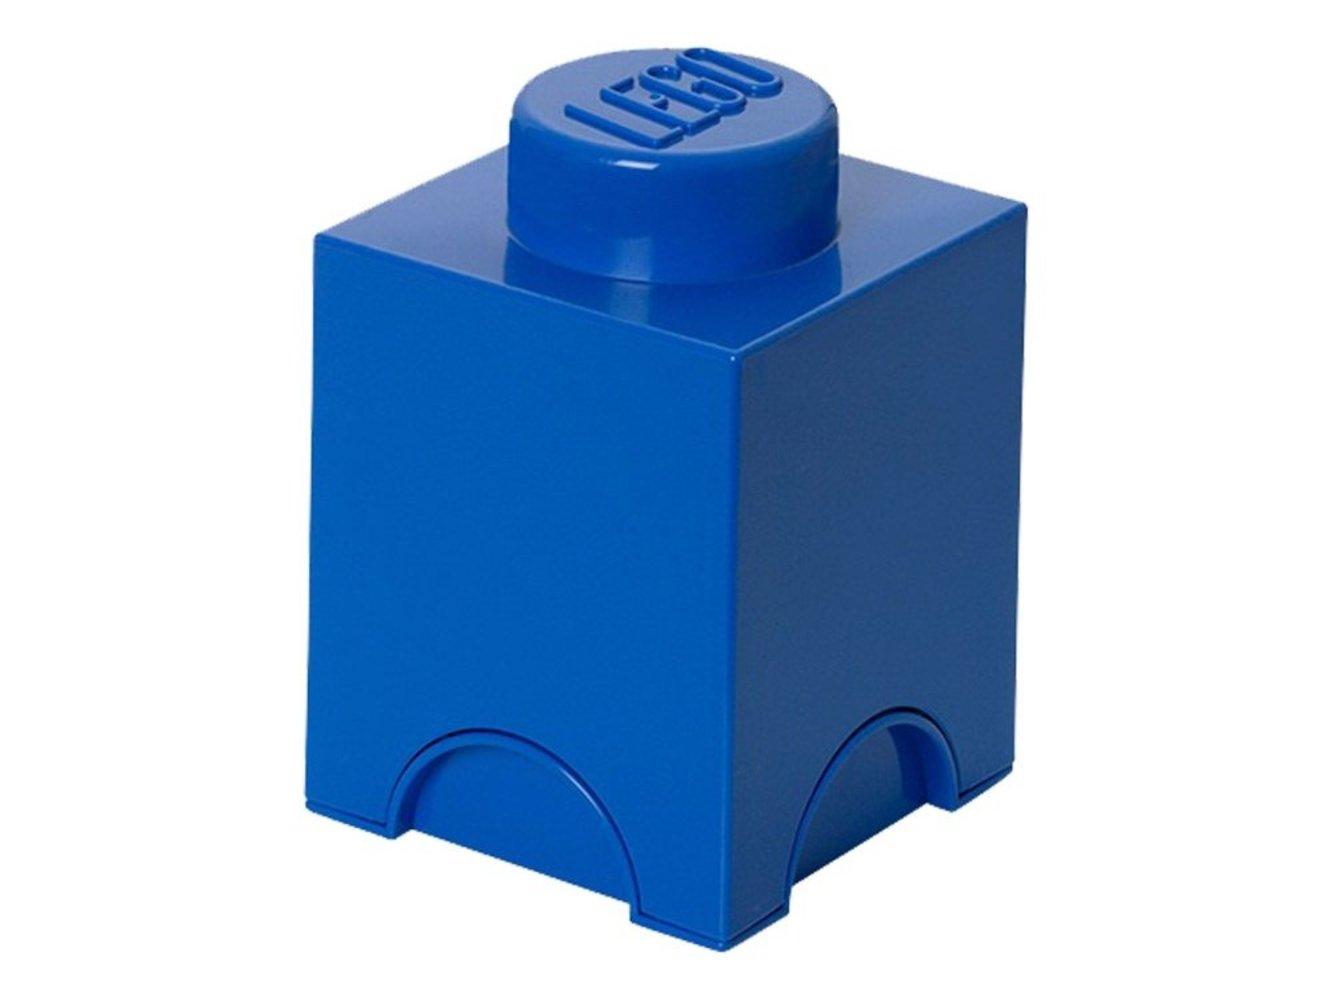 Single Stud Blue Storage Brick